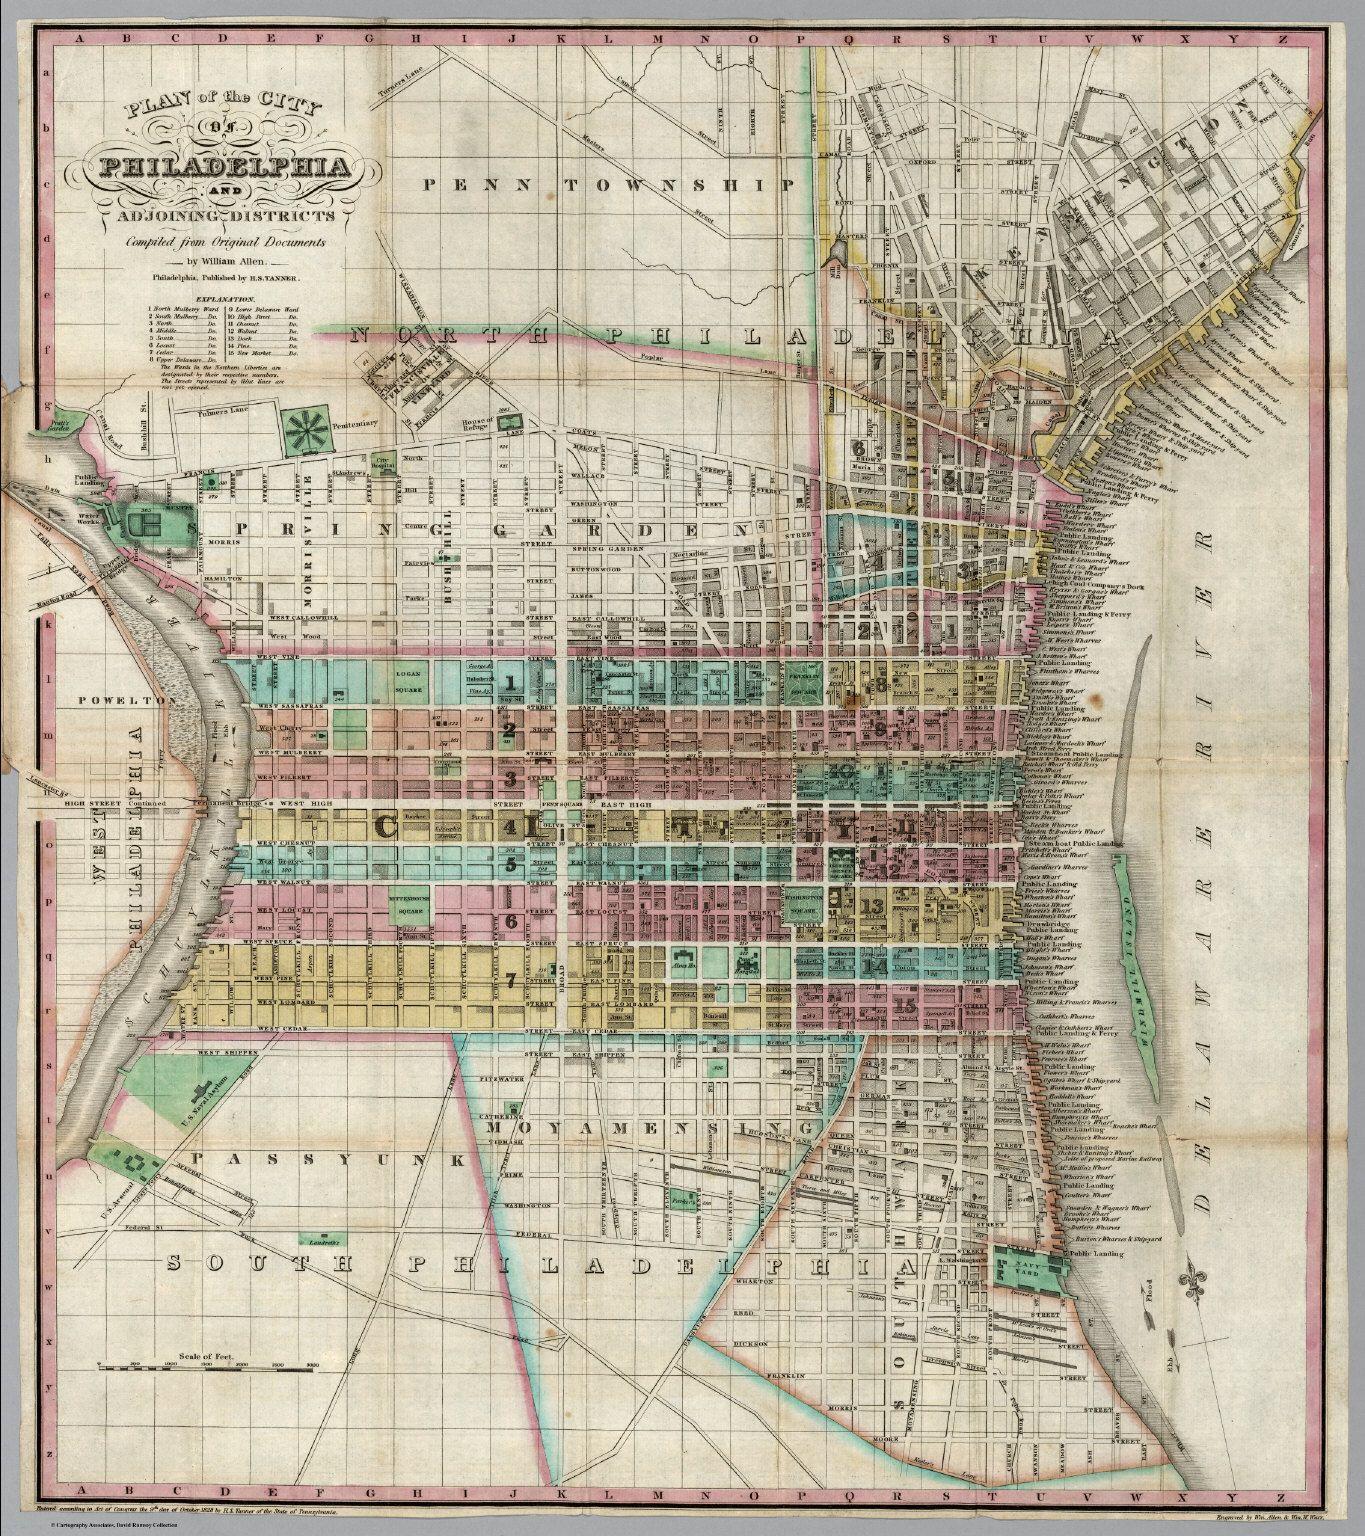 philadelphia city map circa   google search. philadelphia city map circa   google search  gouverneur